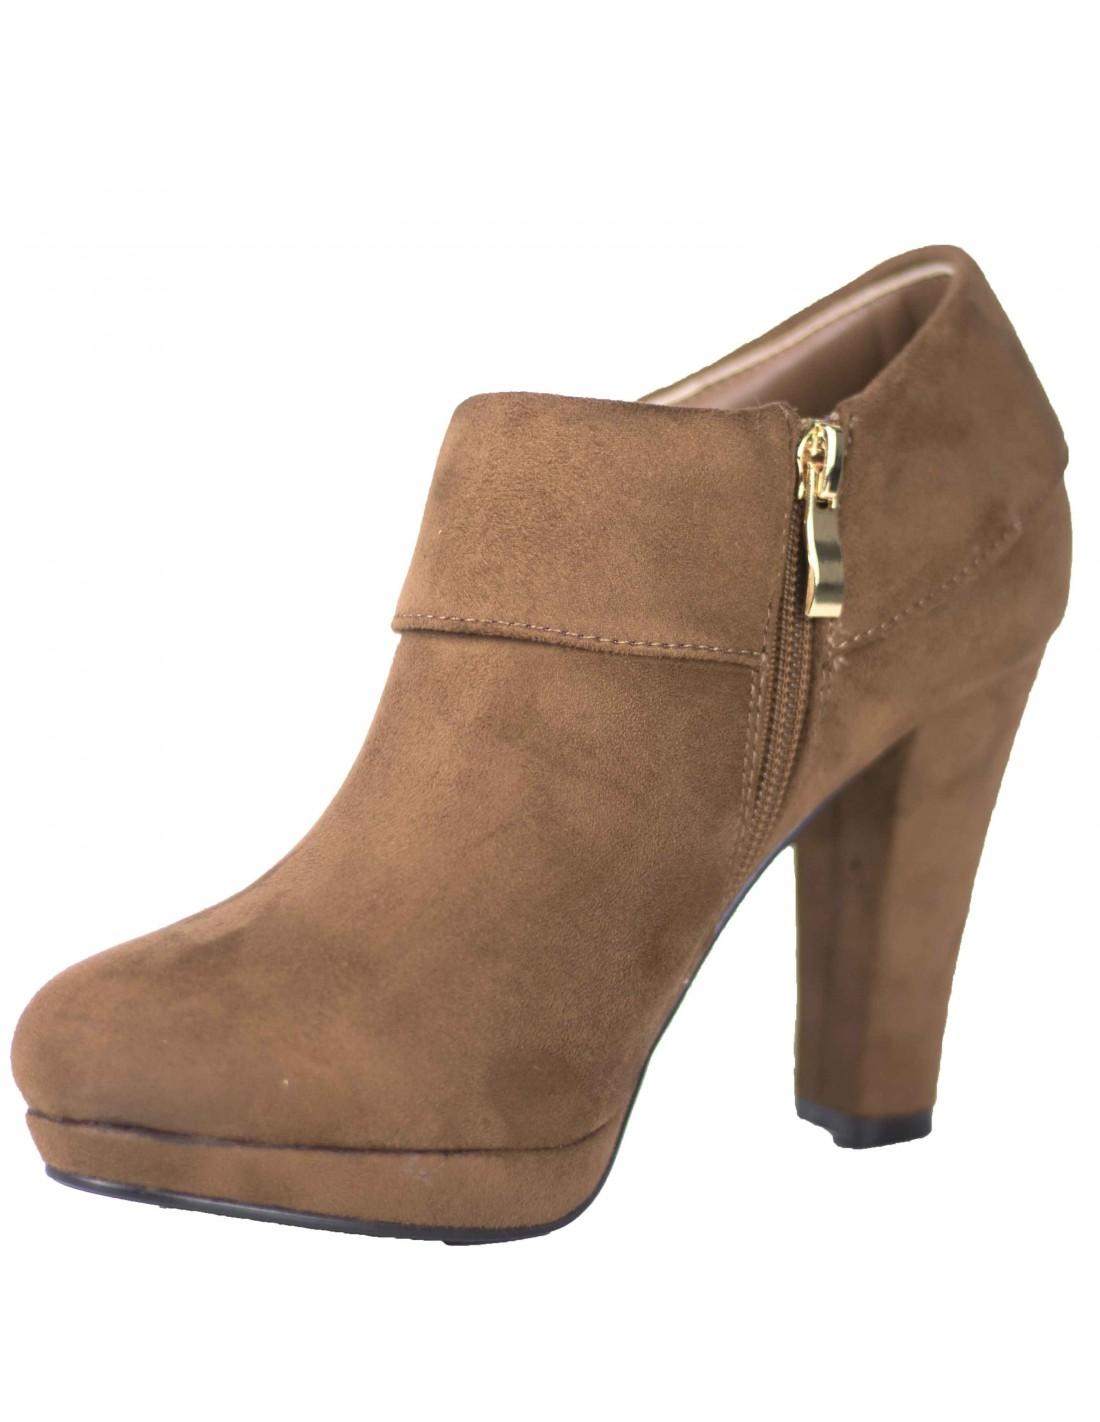 bottines femme low boots camel aspect daim fantaisie m tal dor. Black Bedroom Furniture Sets. Home Design Ideas